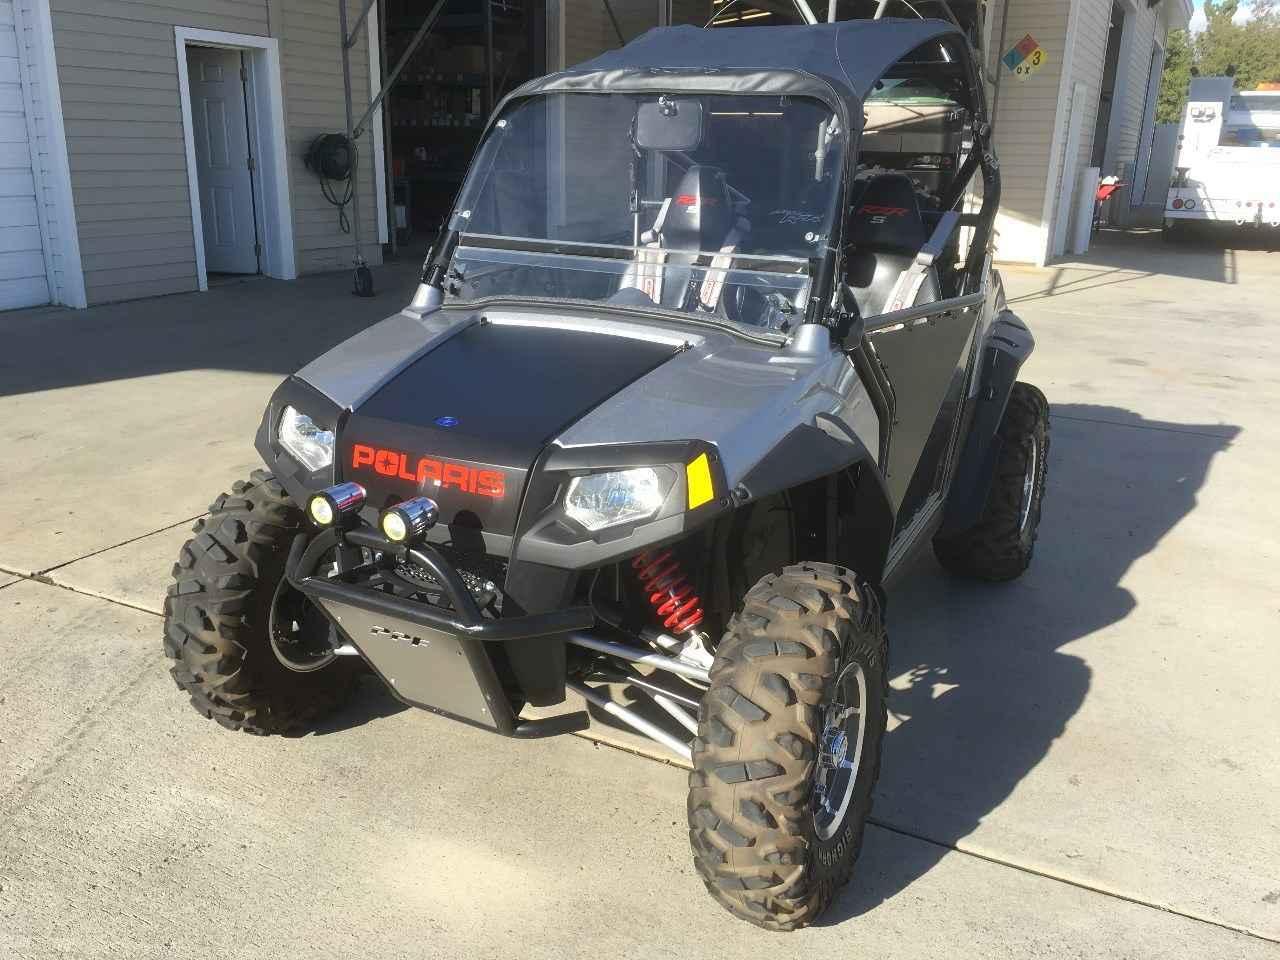 Used 2009 Polaris RZR S 800 ATVs For Sale in California on atvtrades com